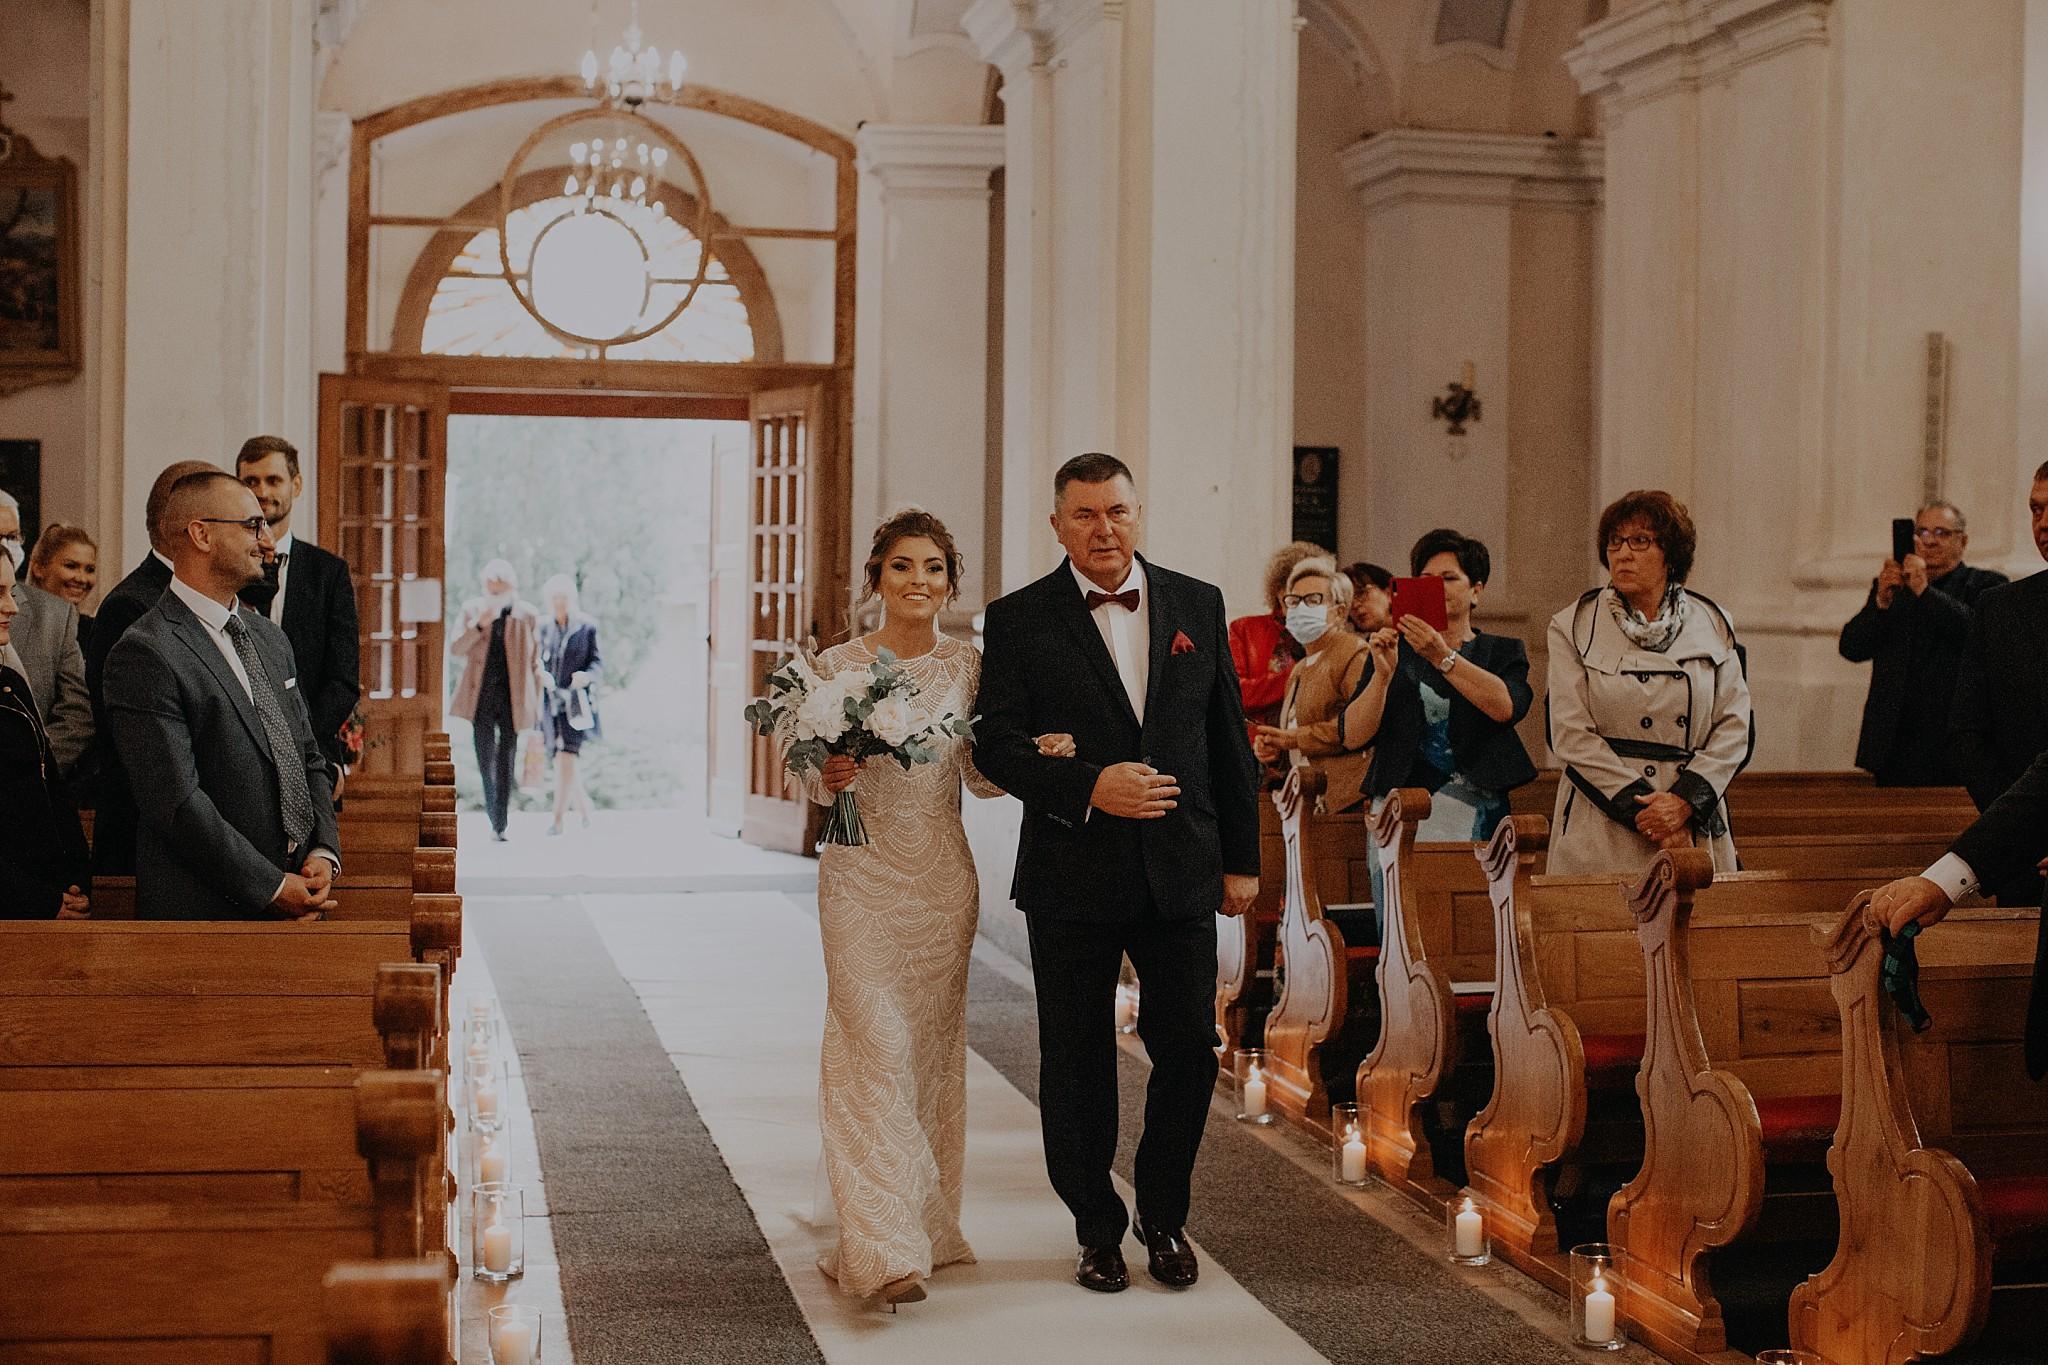 fotograf poznan wesele dobra truskawka piekne wesele pod poznaniem wesele w dobrej truskawce piekna para mloda slub marzen slub koronawirus slub listopad wesele koronawirus 152